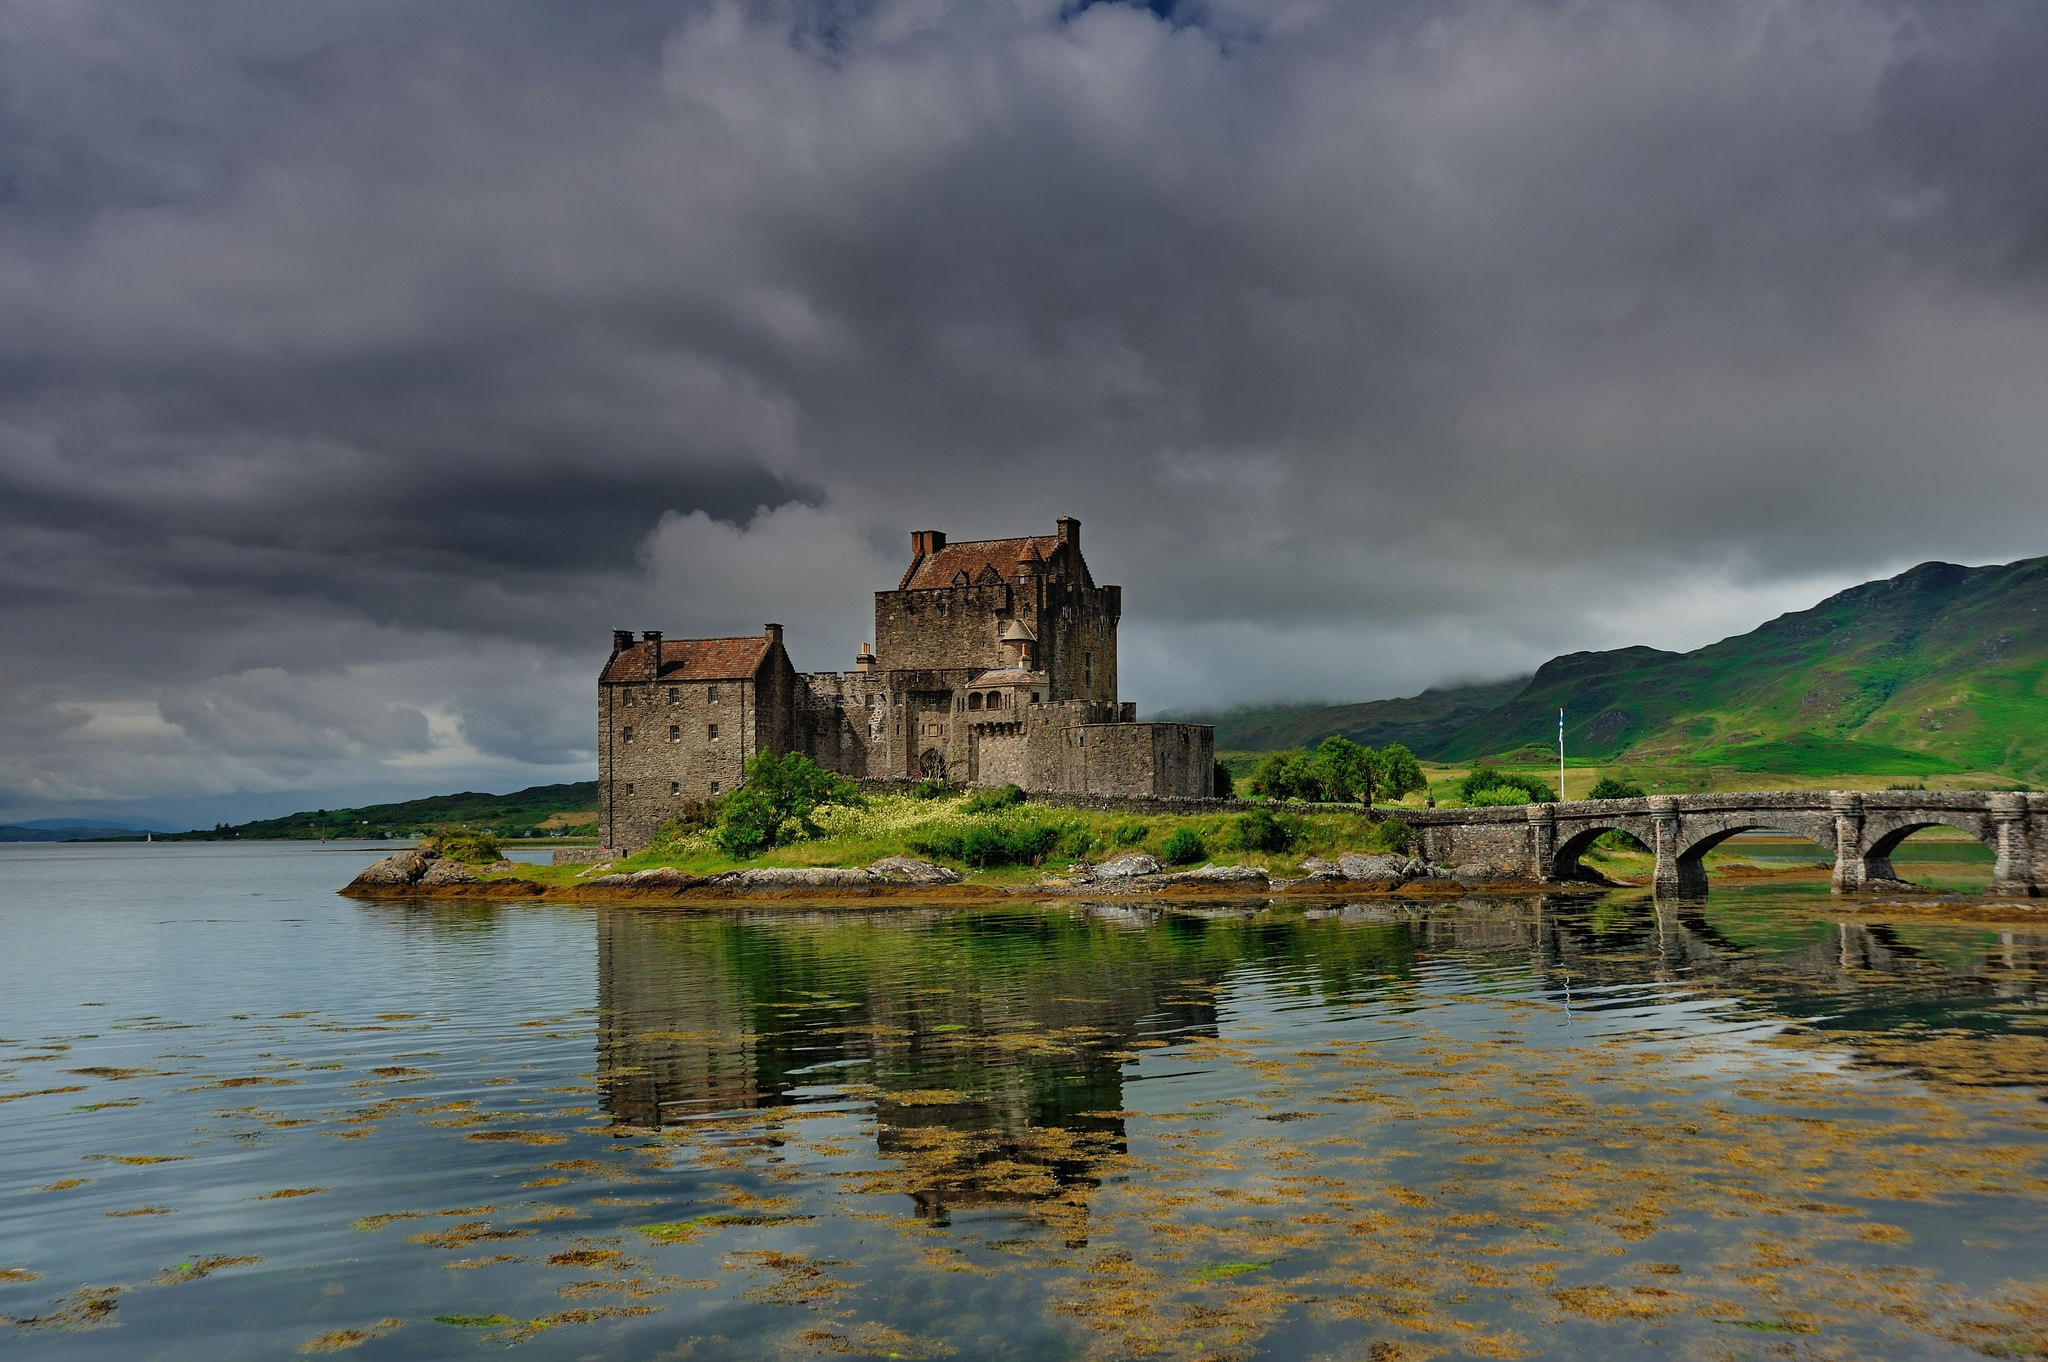 Bridge Castle Eilean Donan Castle Lake Scotland 2048x1362